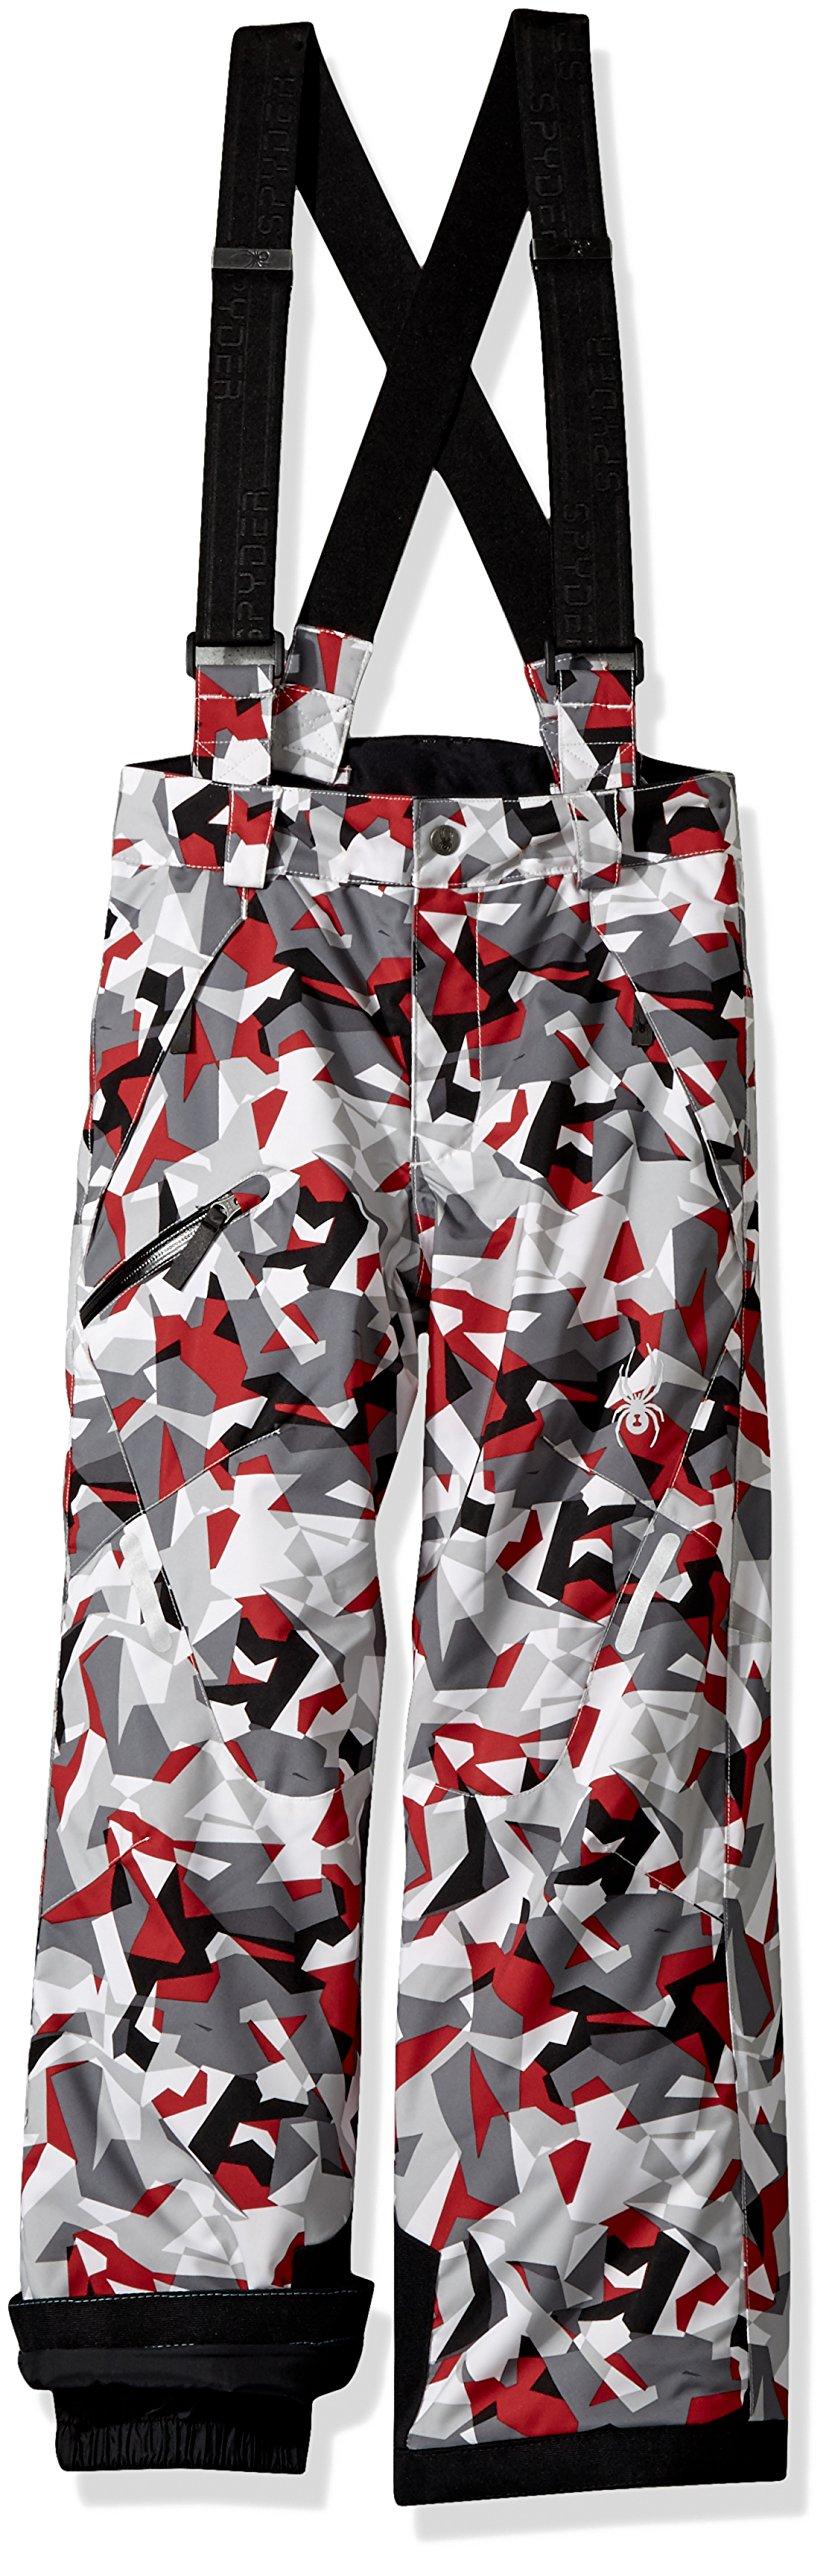 Spyder Boy's Propulsion Ski Pant, White Mini Camo Print, Size 08